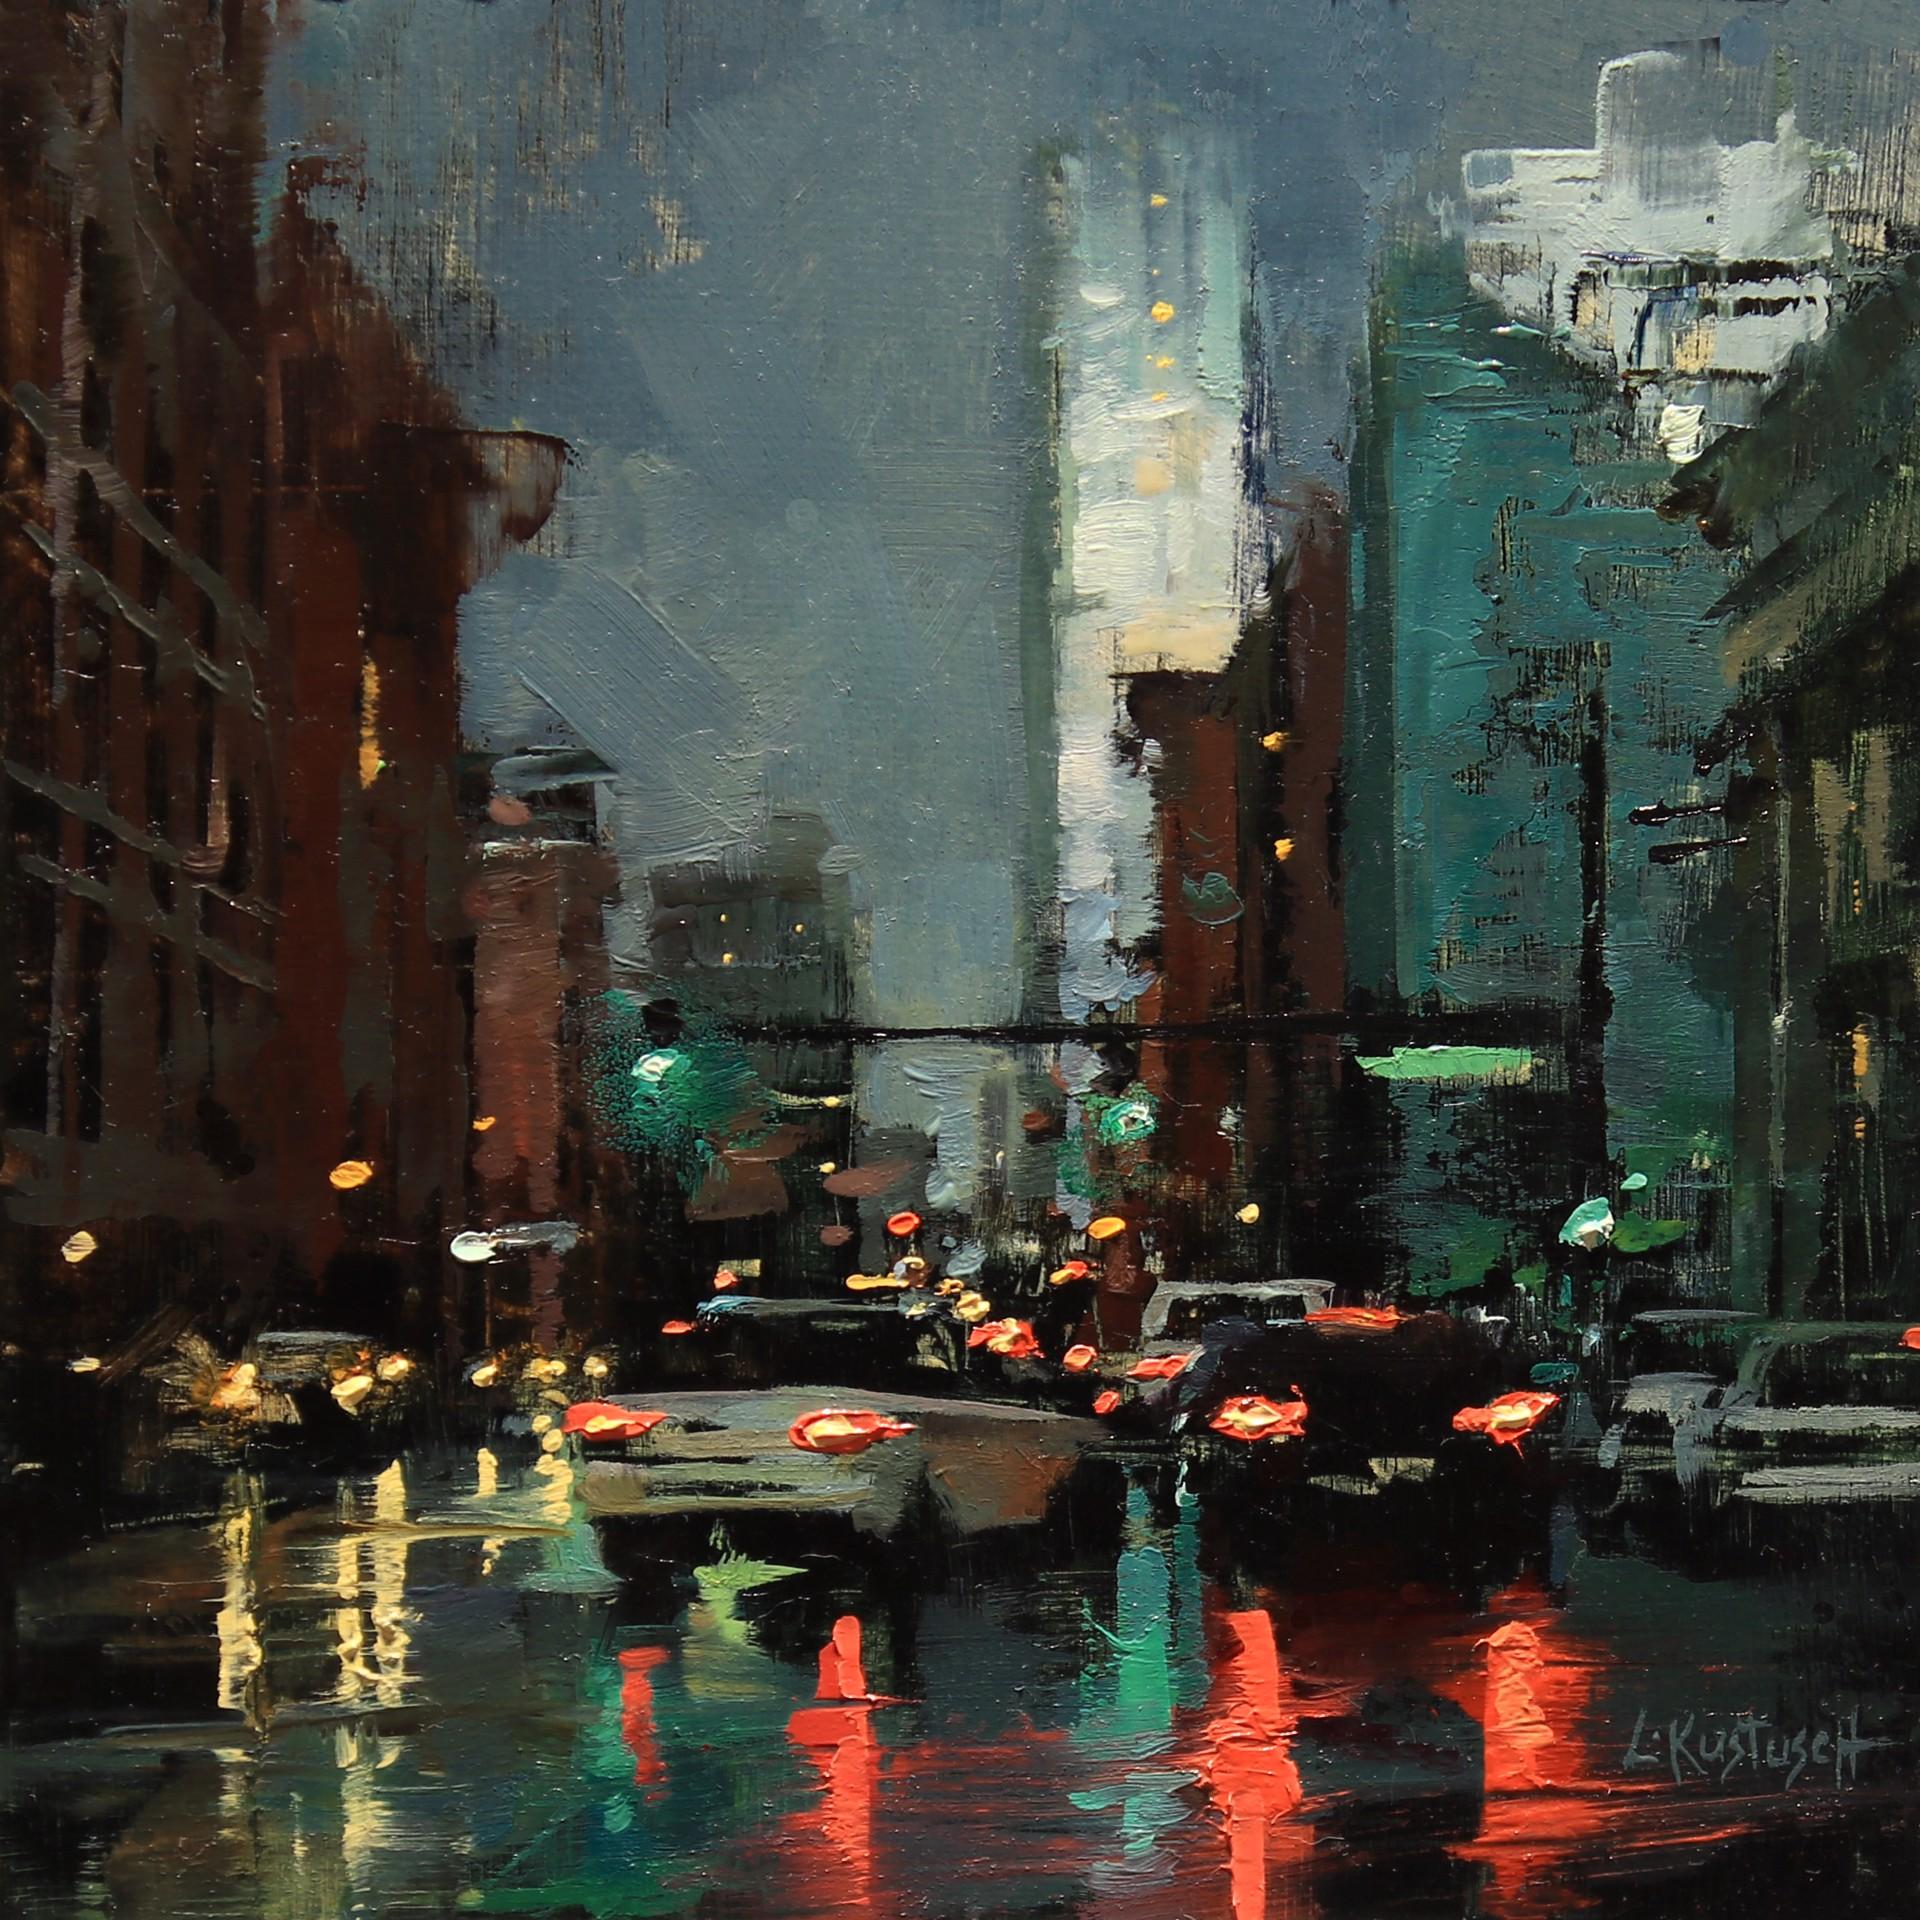 15th St. & Wewatta by Lindsey Kustusch